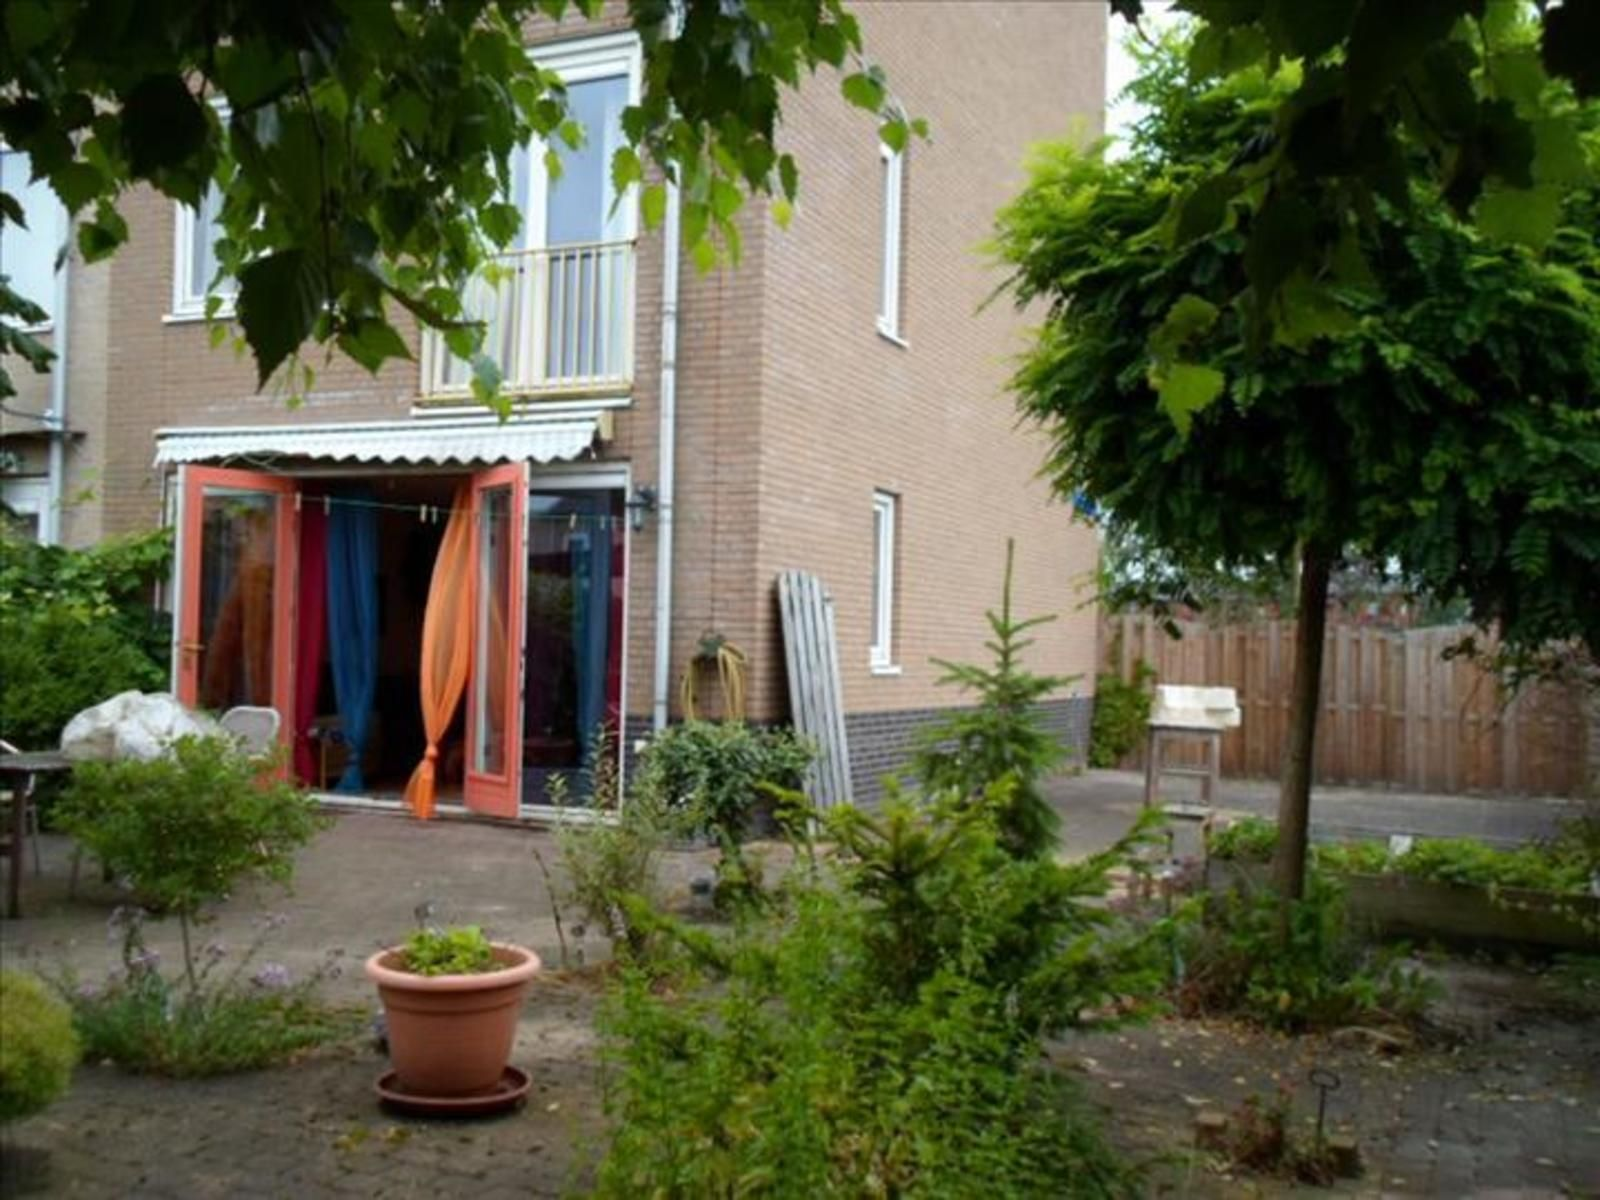 Carol Vogesgracht 31, Almere